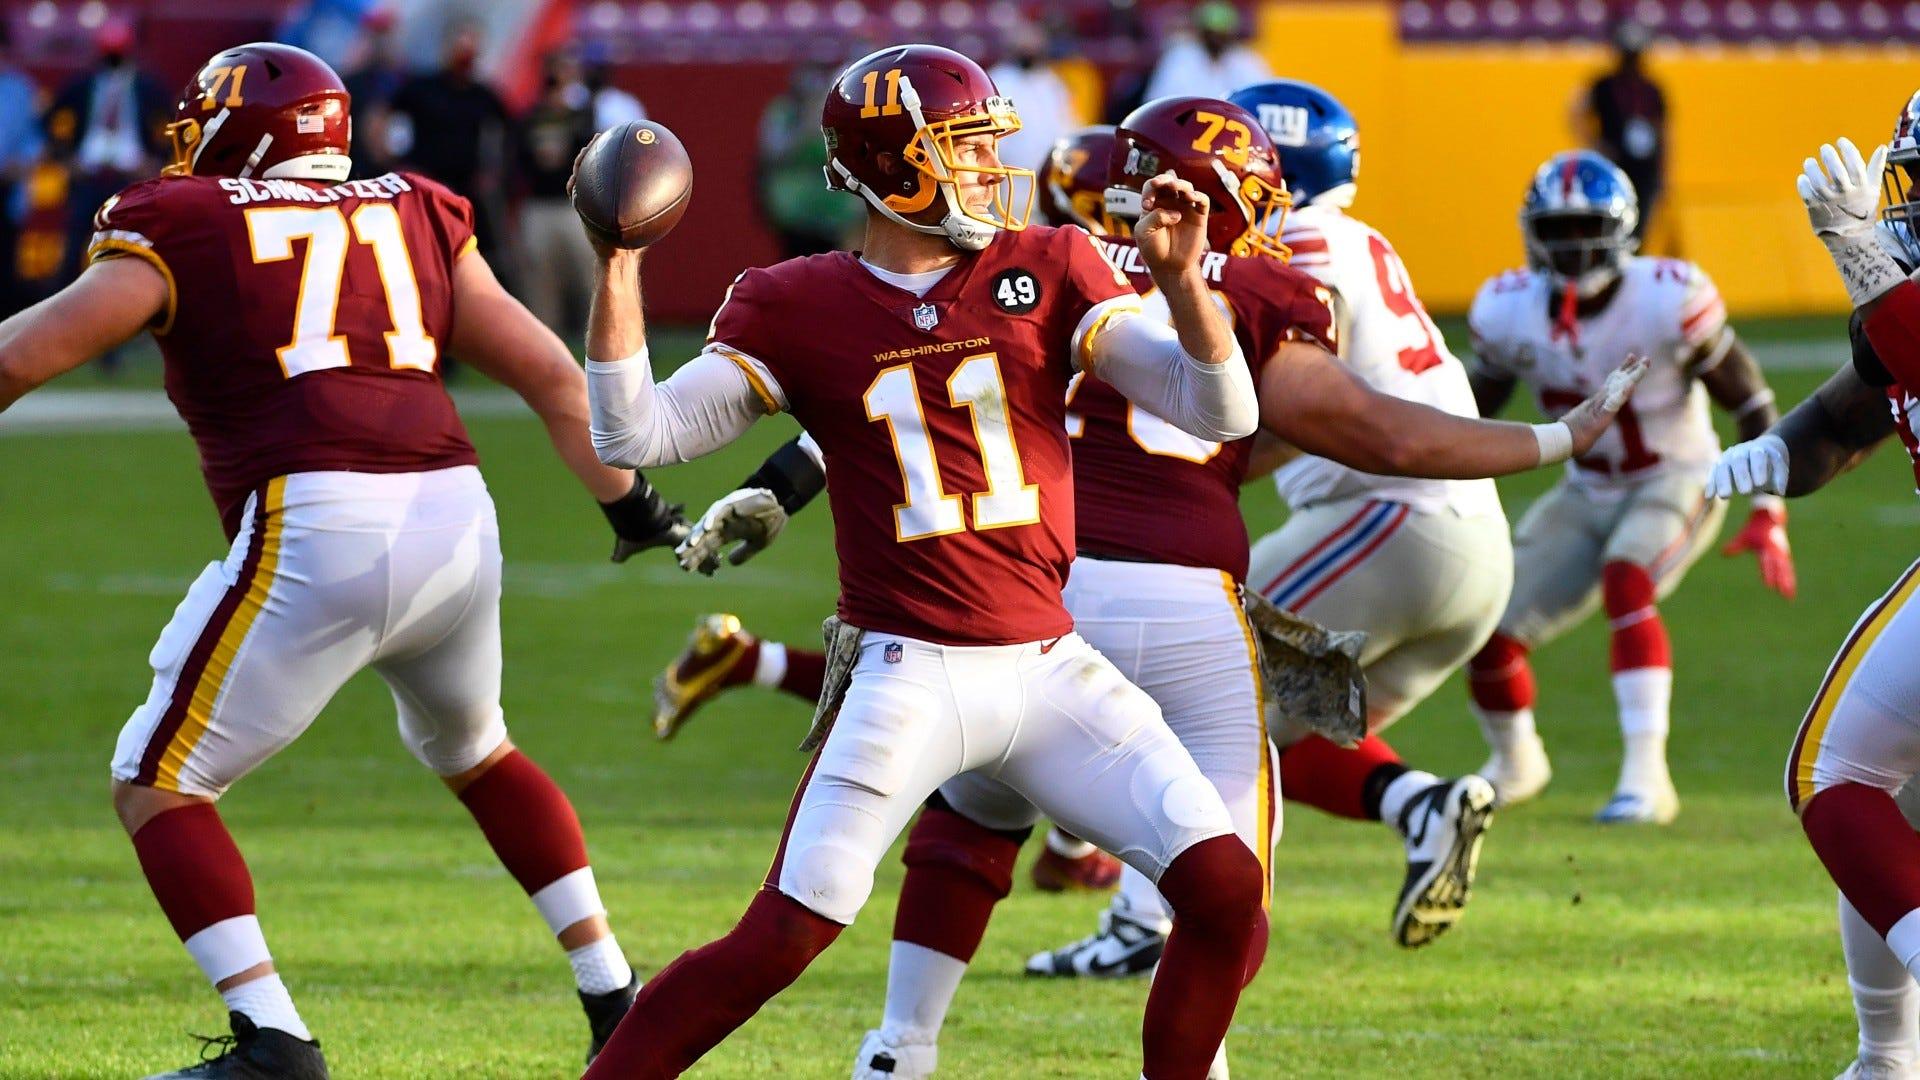 Washington Football S Kyle Allen Suffers Gruesome Leg Injury